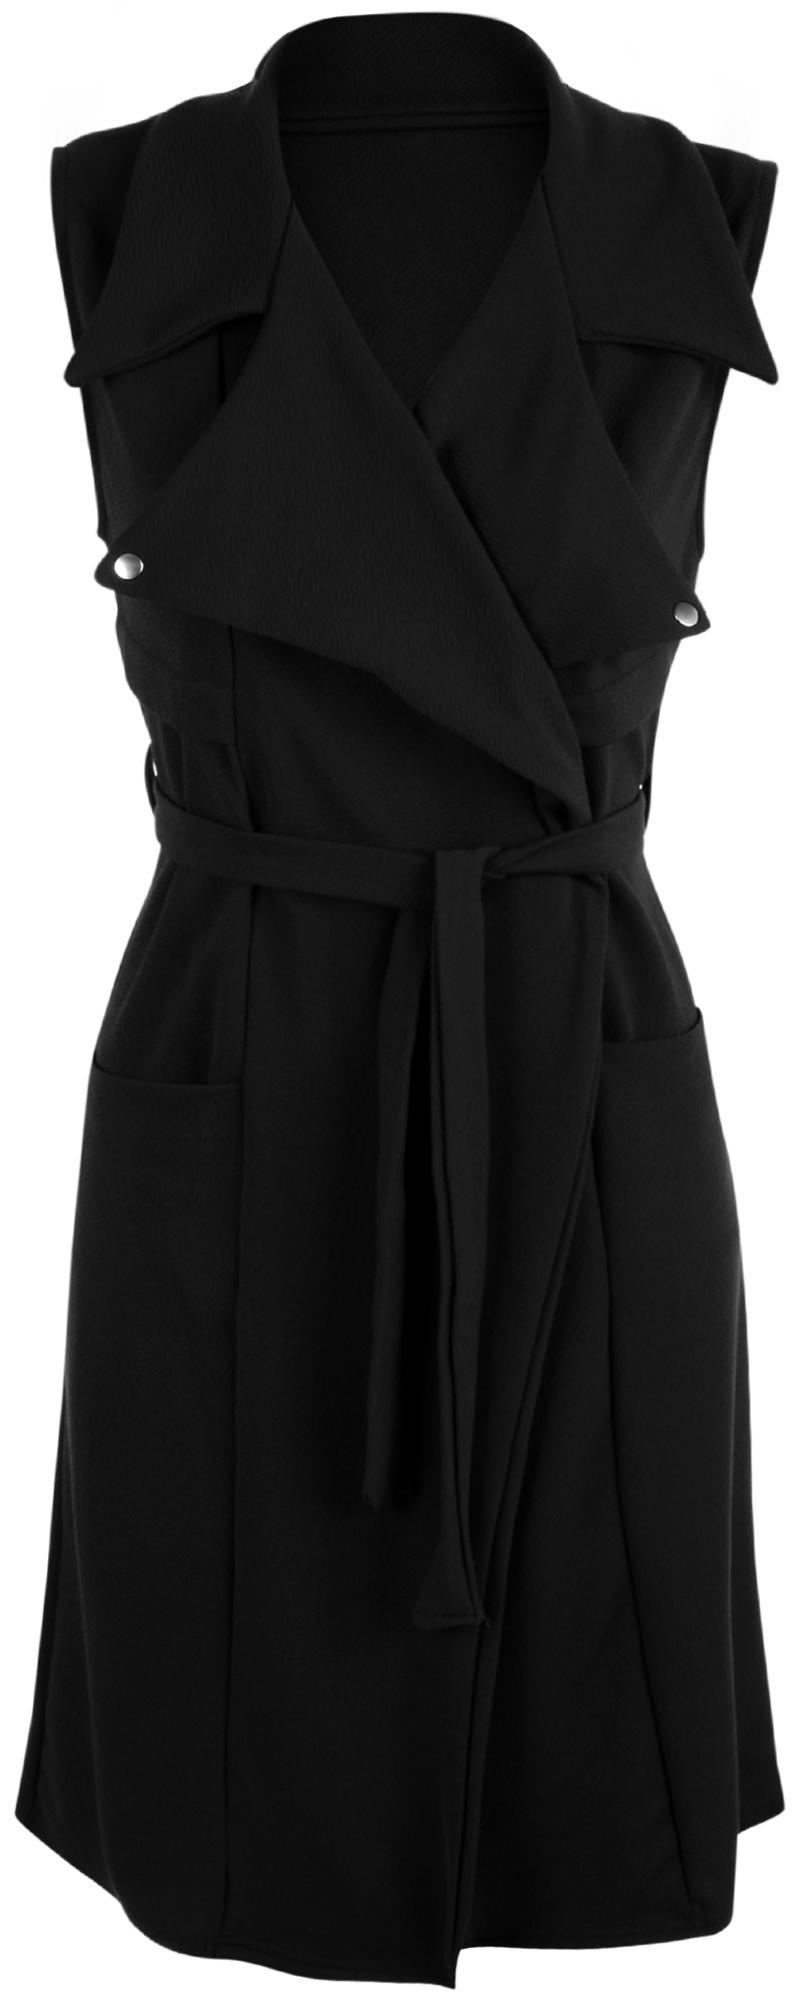 neu damen rmellos ge ffnet g rtel lang mantel jacke top. Black Bedroom Furniture Sets. Home Design Ideas